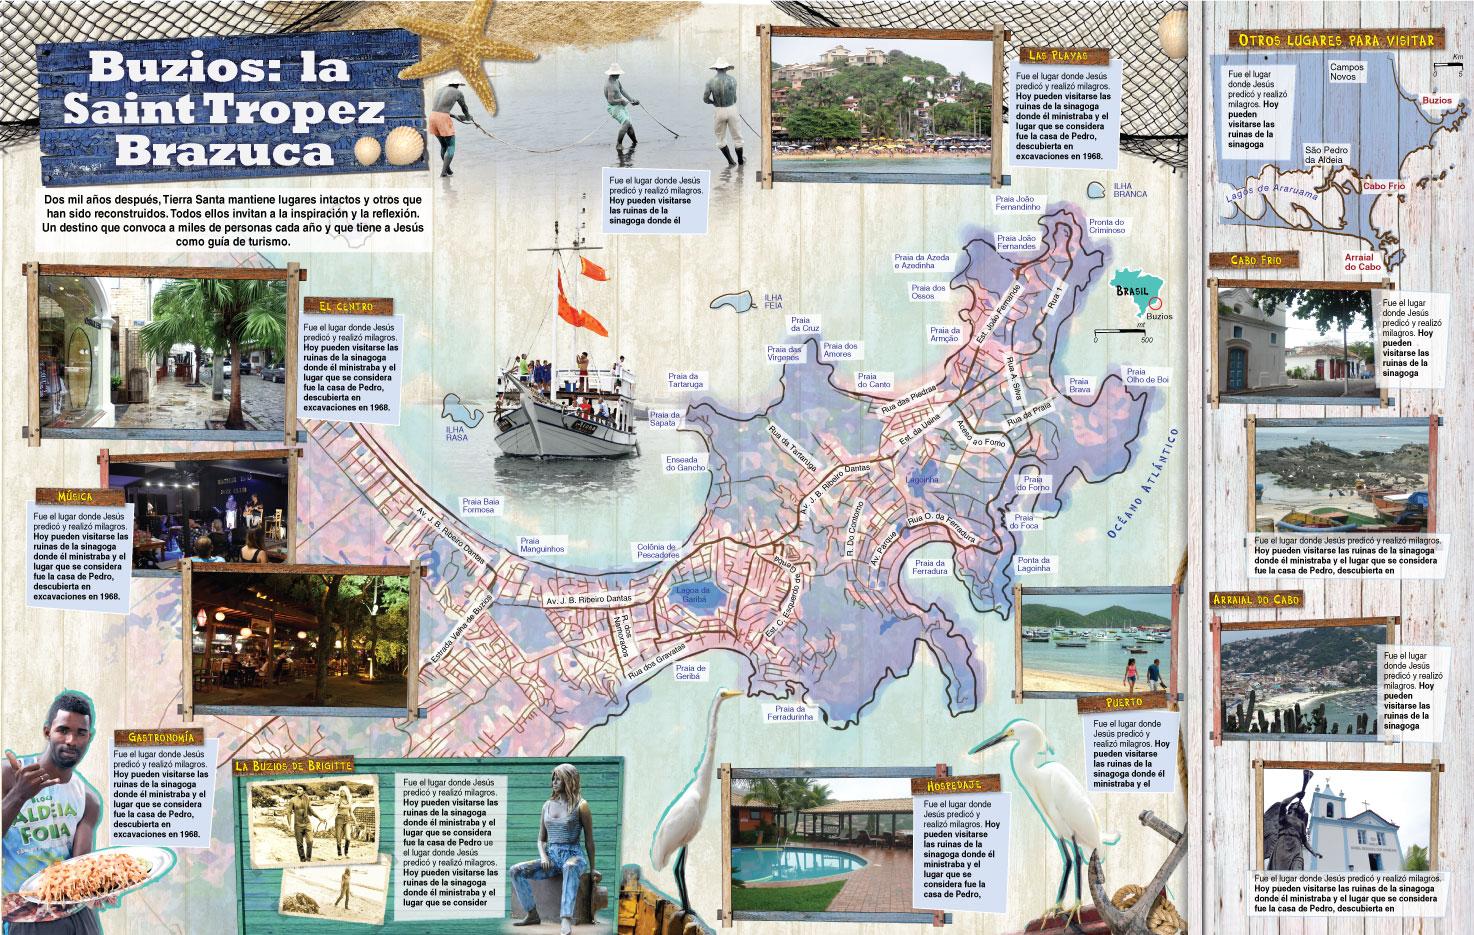 Buzios: the Saint Tropez Brazuca